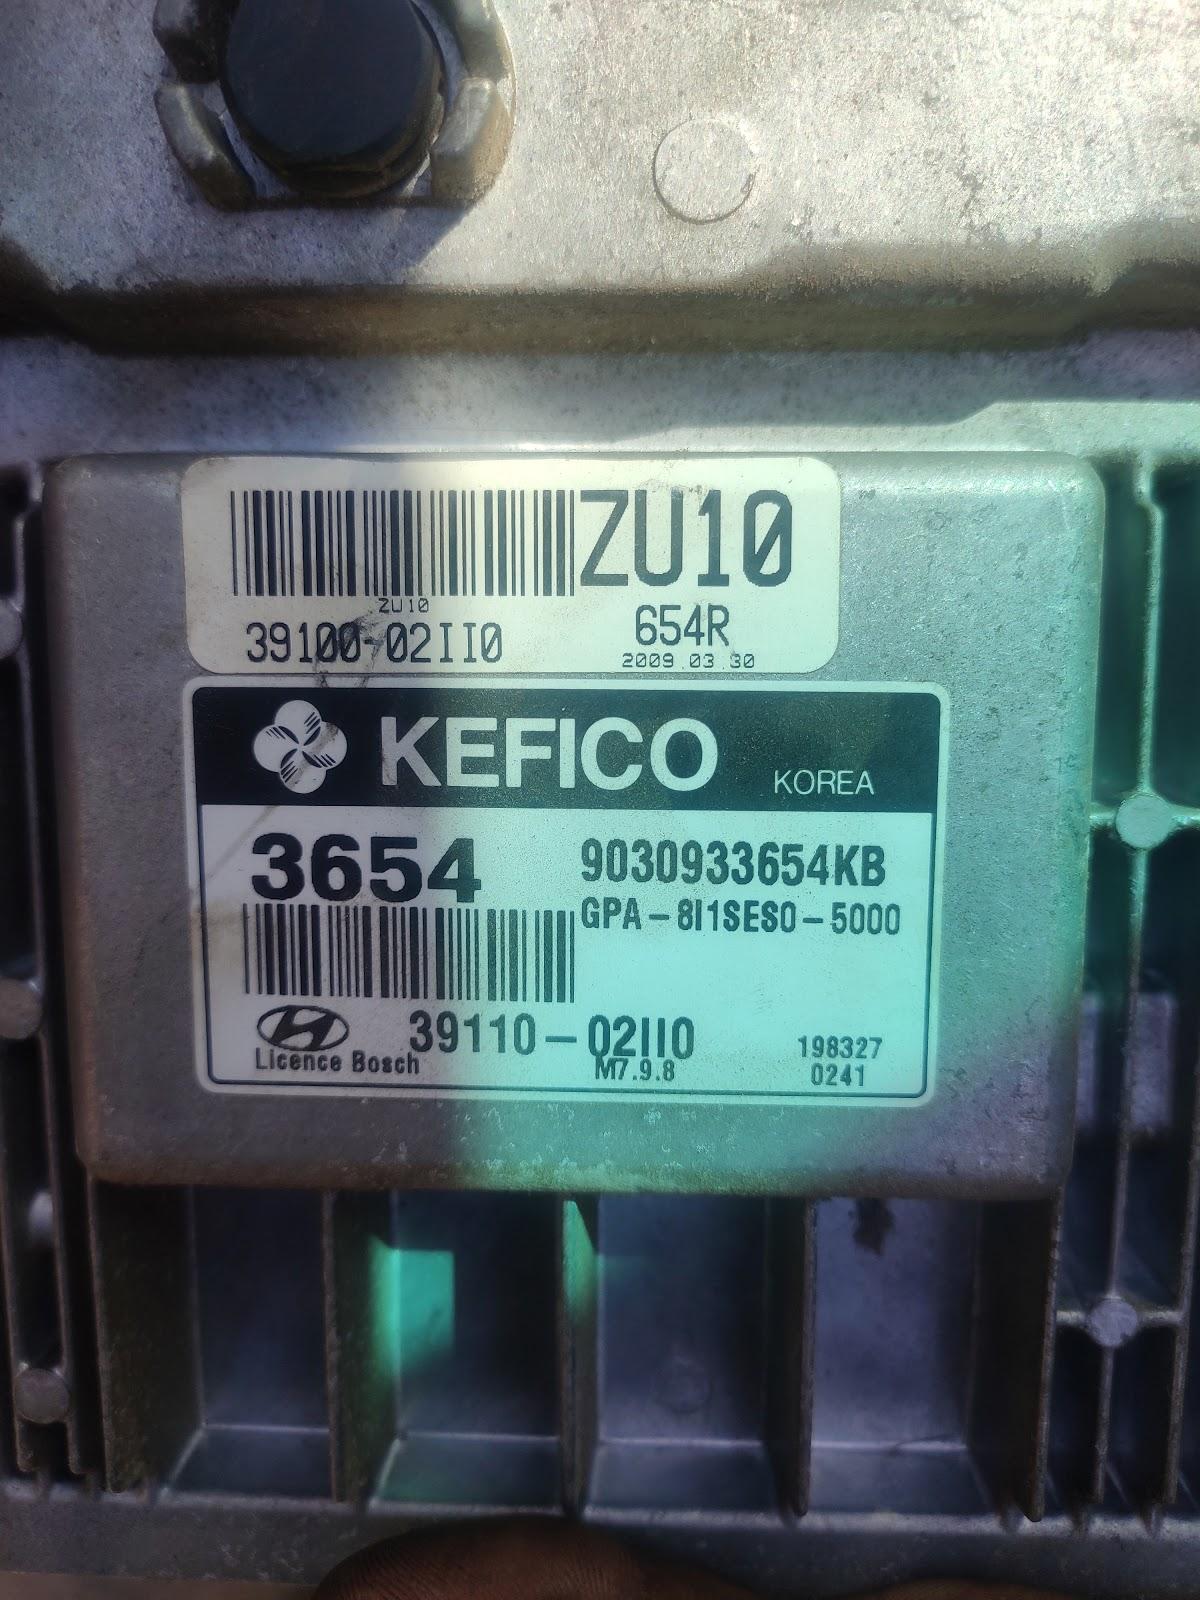 Hyundai I20 Used Ecm Kefico Ecu Hyundai